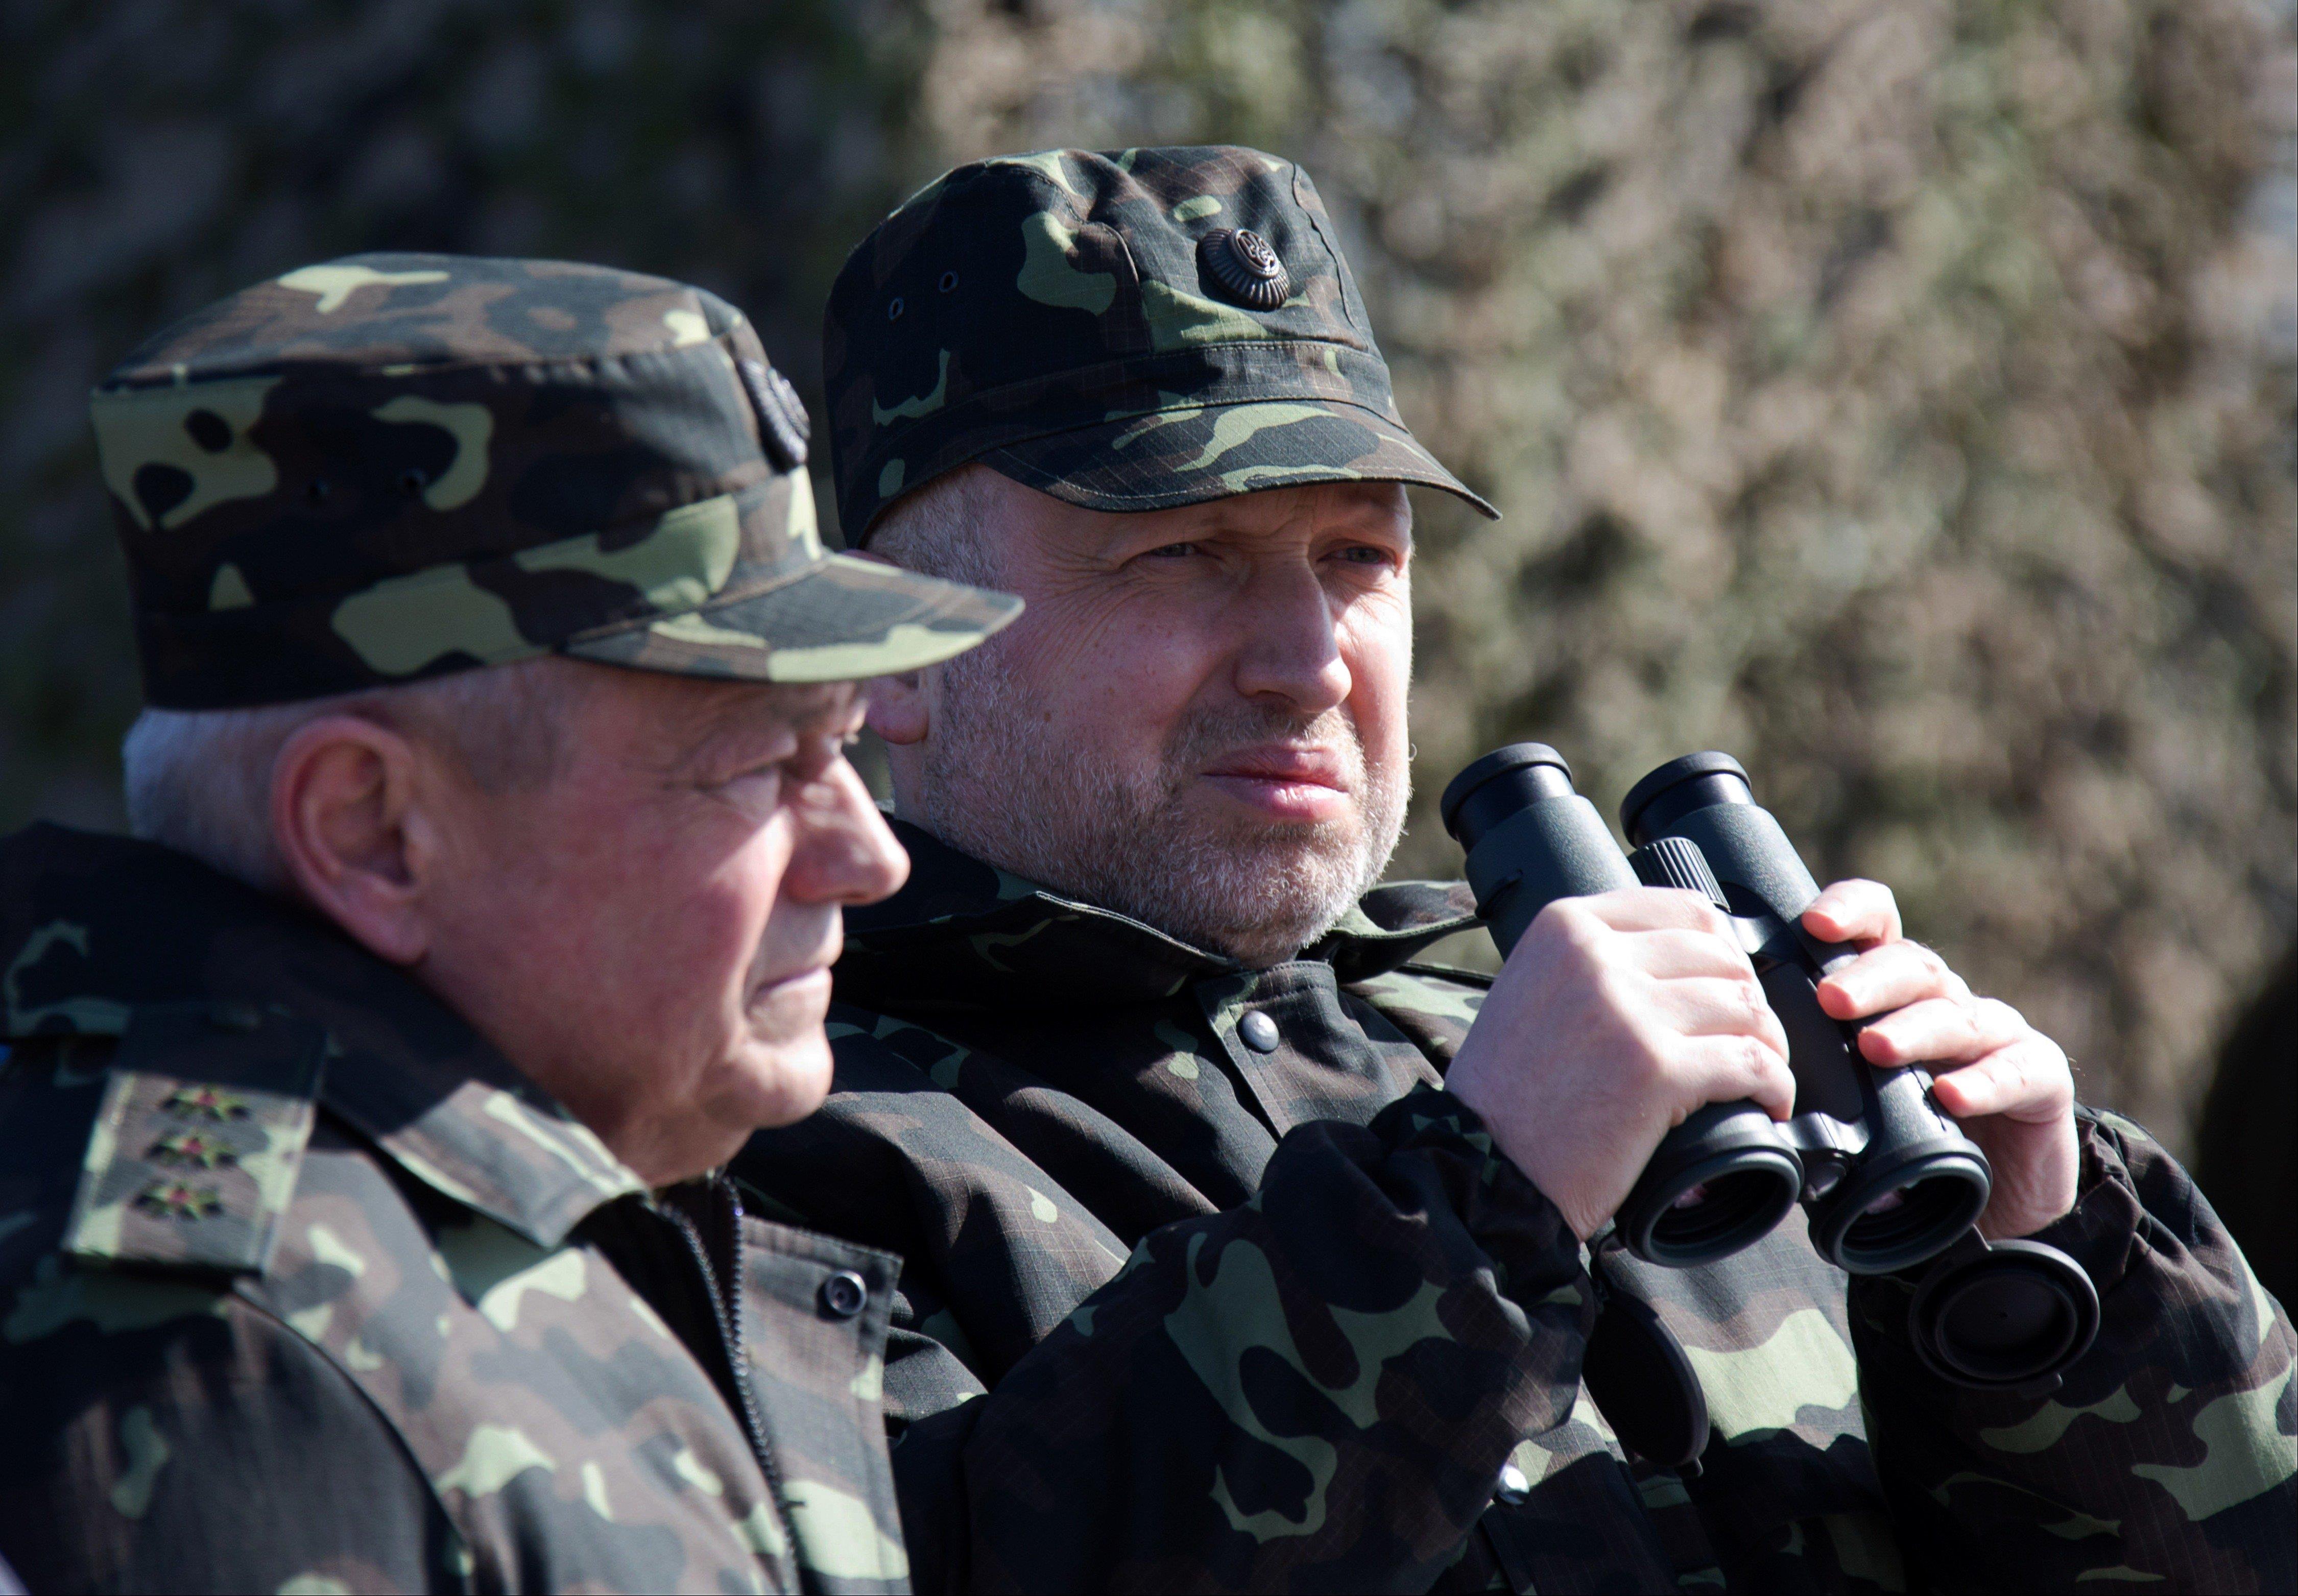 Image: Oleksandr Turchynov, Igor Tenyukh